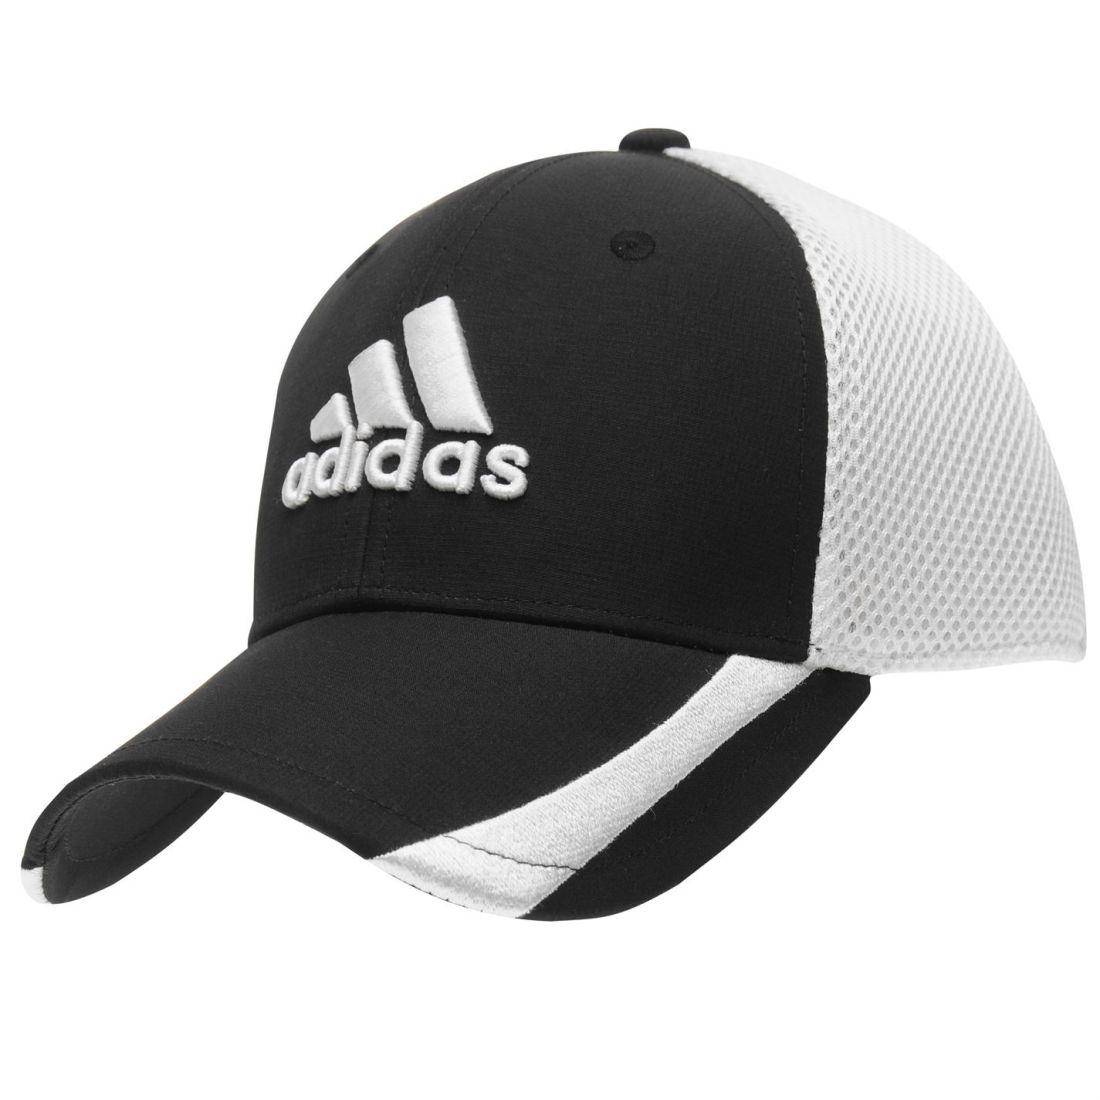 5ab1e6d3c5075 adidas Mens Tour RDR Cap Golf Breathable Mesh Stretch Breathability ...